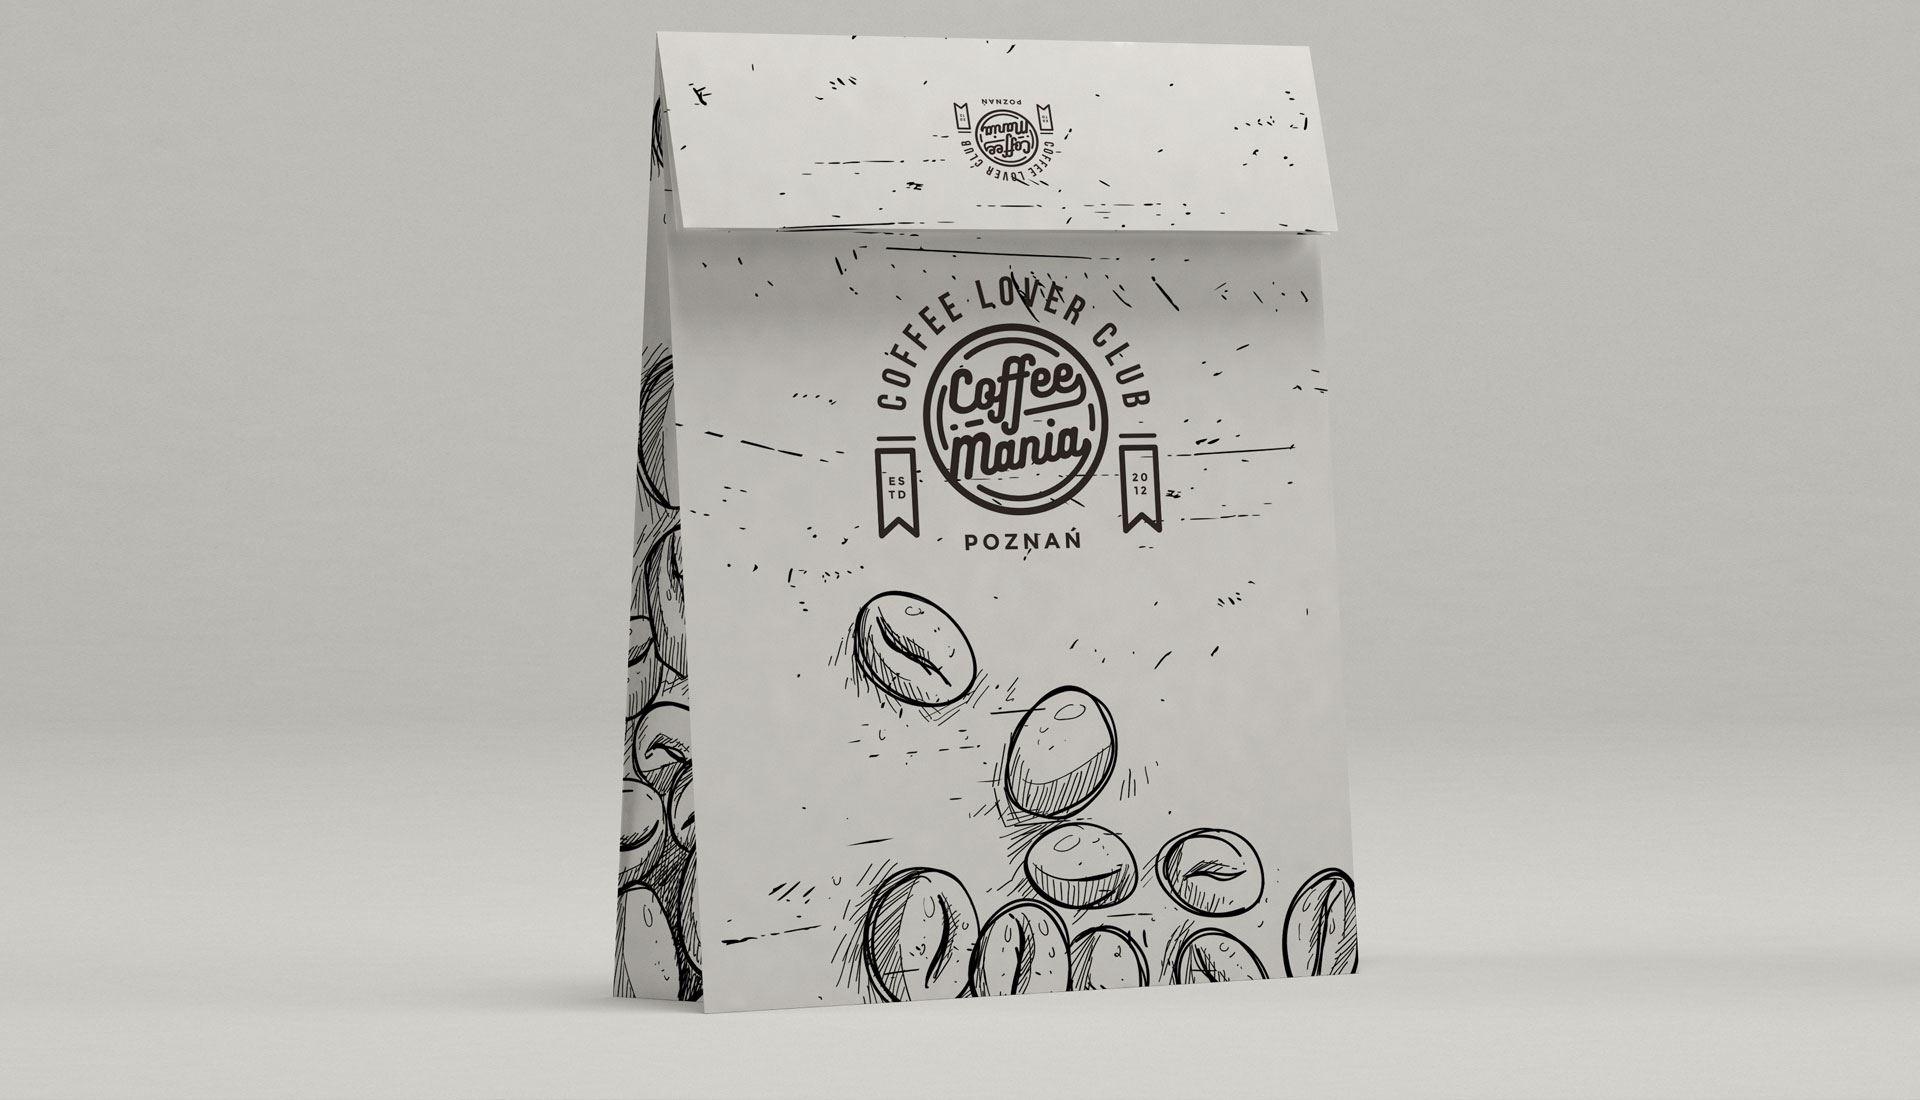 Caffee Mania rzut5 1